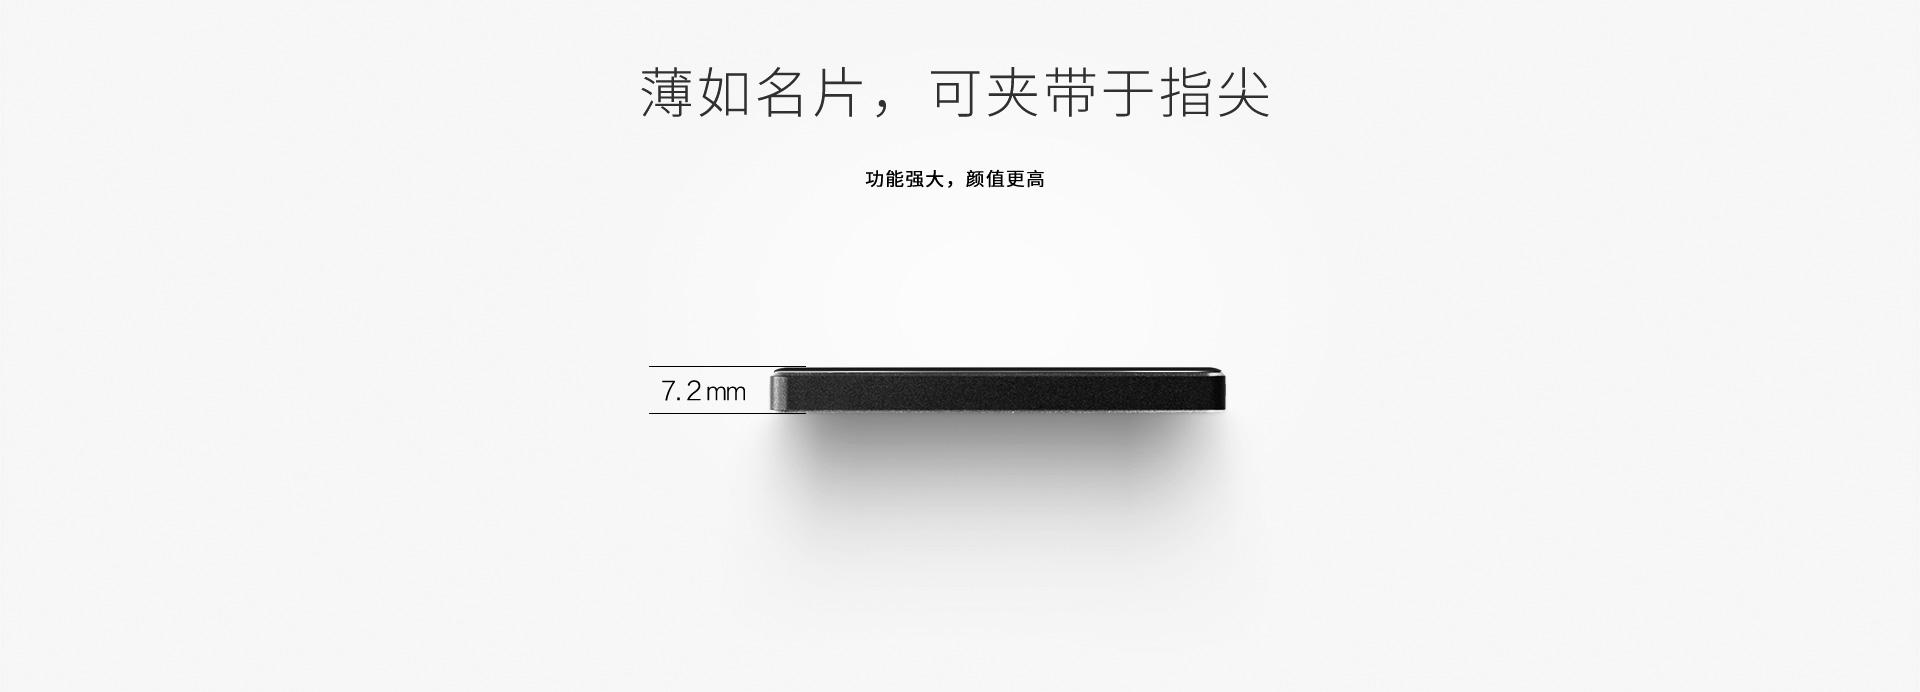 up01_04.jpg